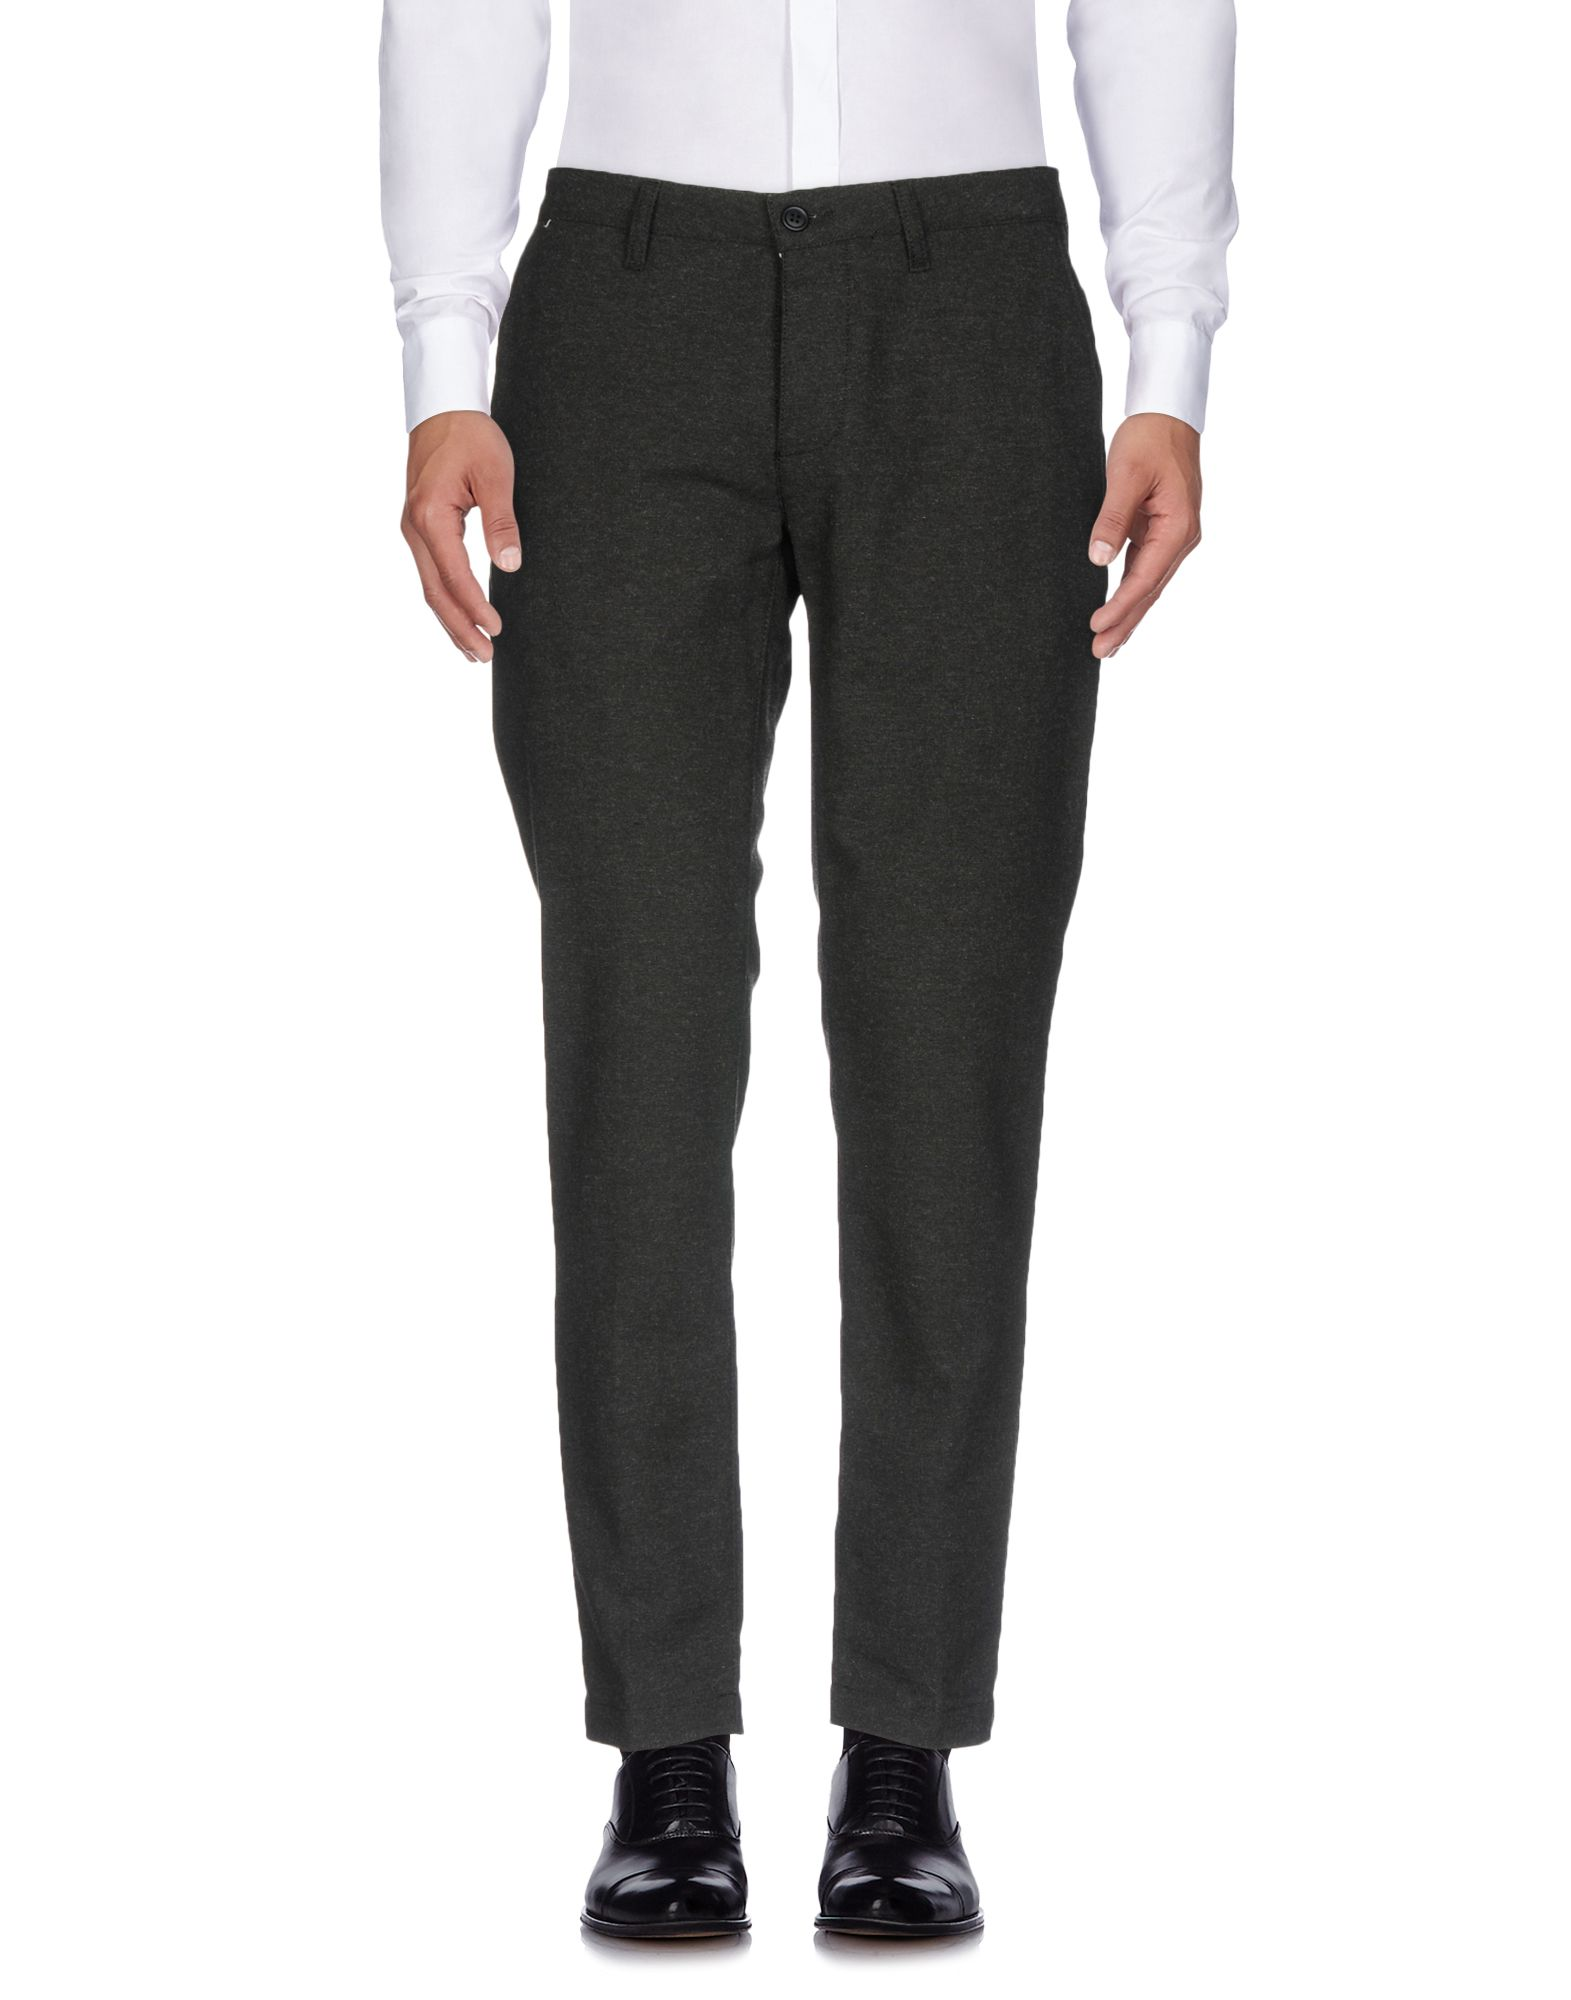 Pantalone Cruna Donna - Acquista online su